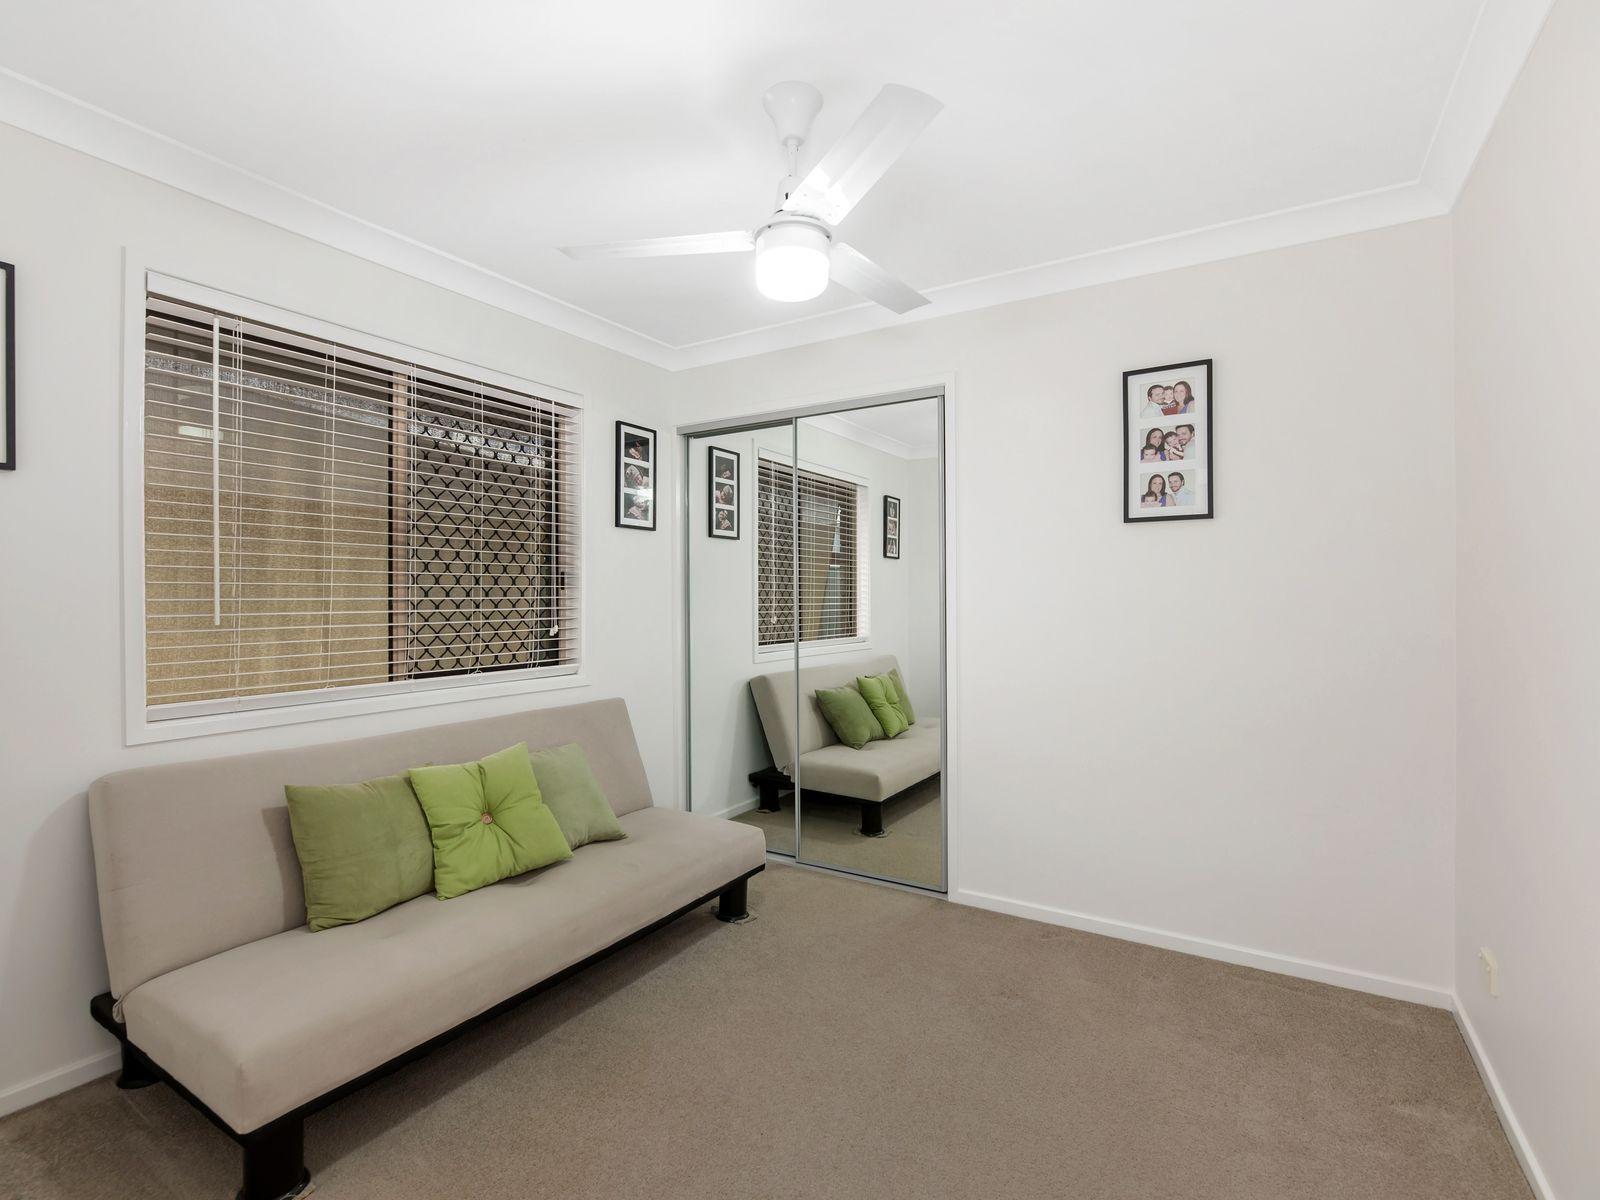 3 Karen Court, Raceview, QLD 4305